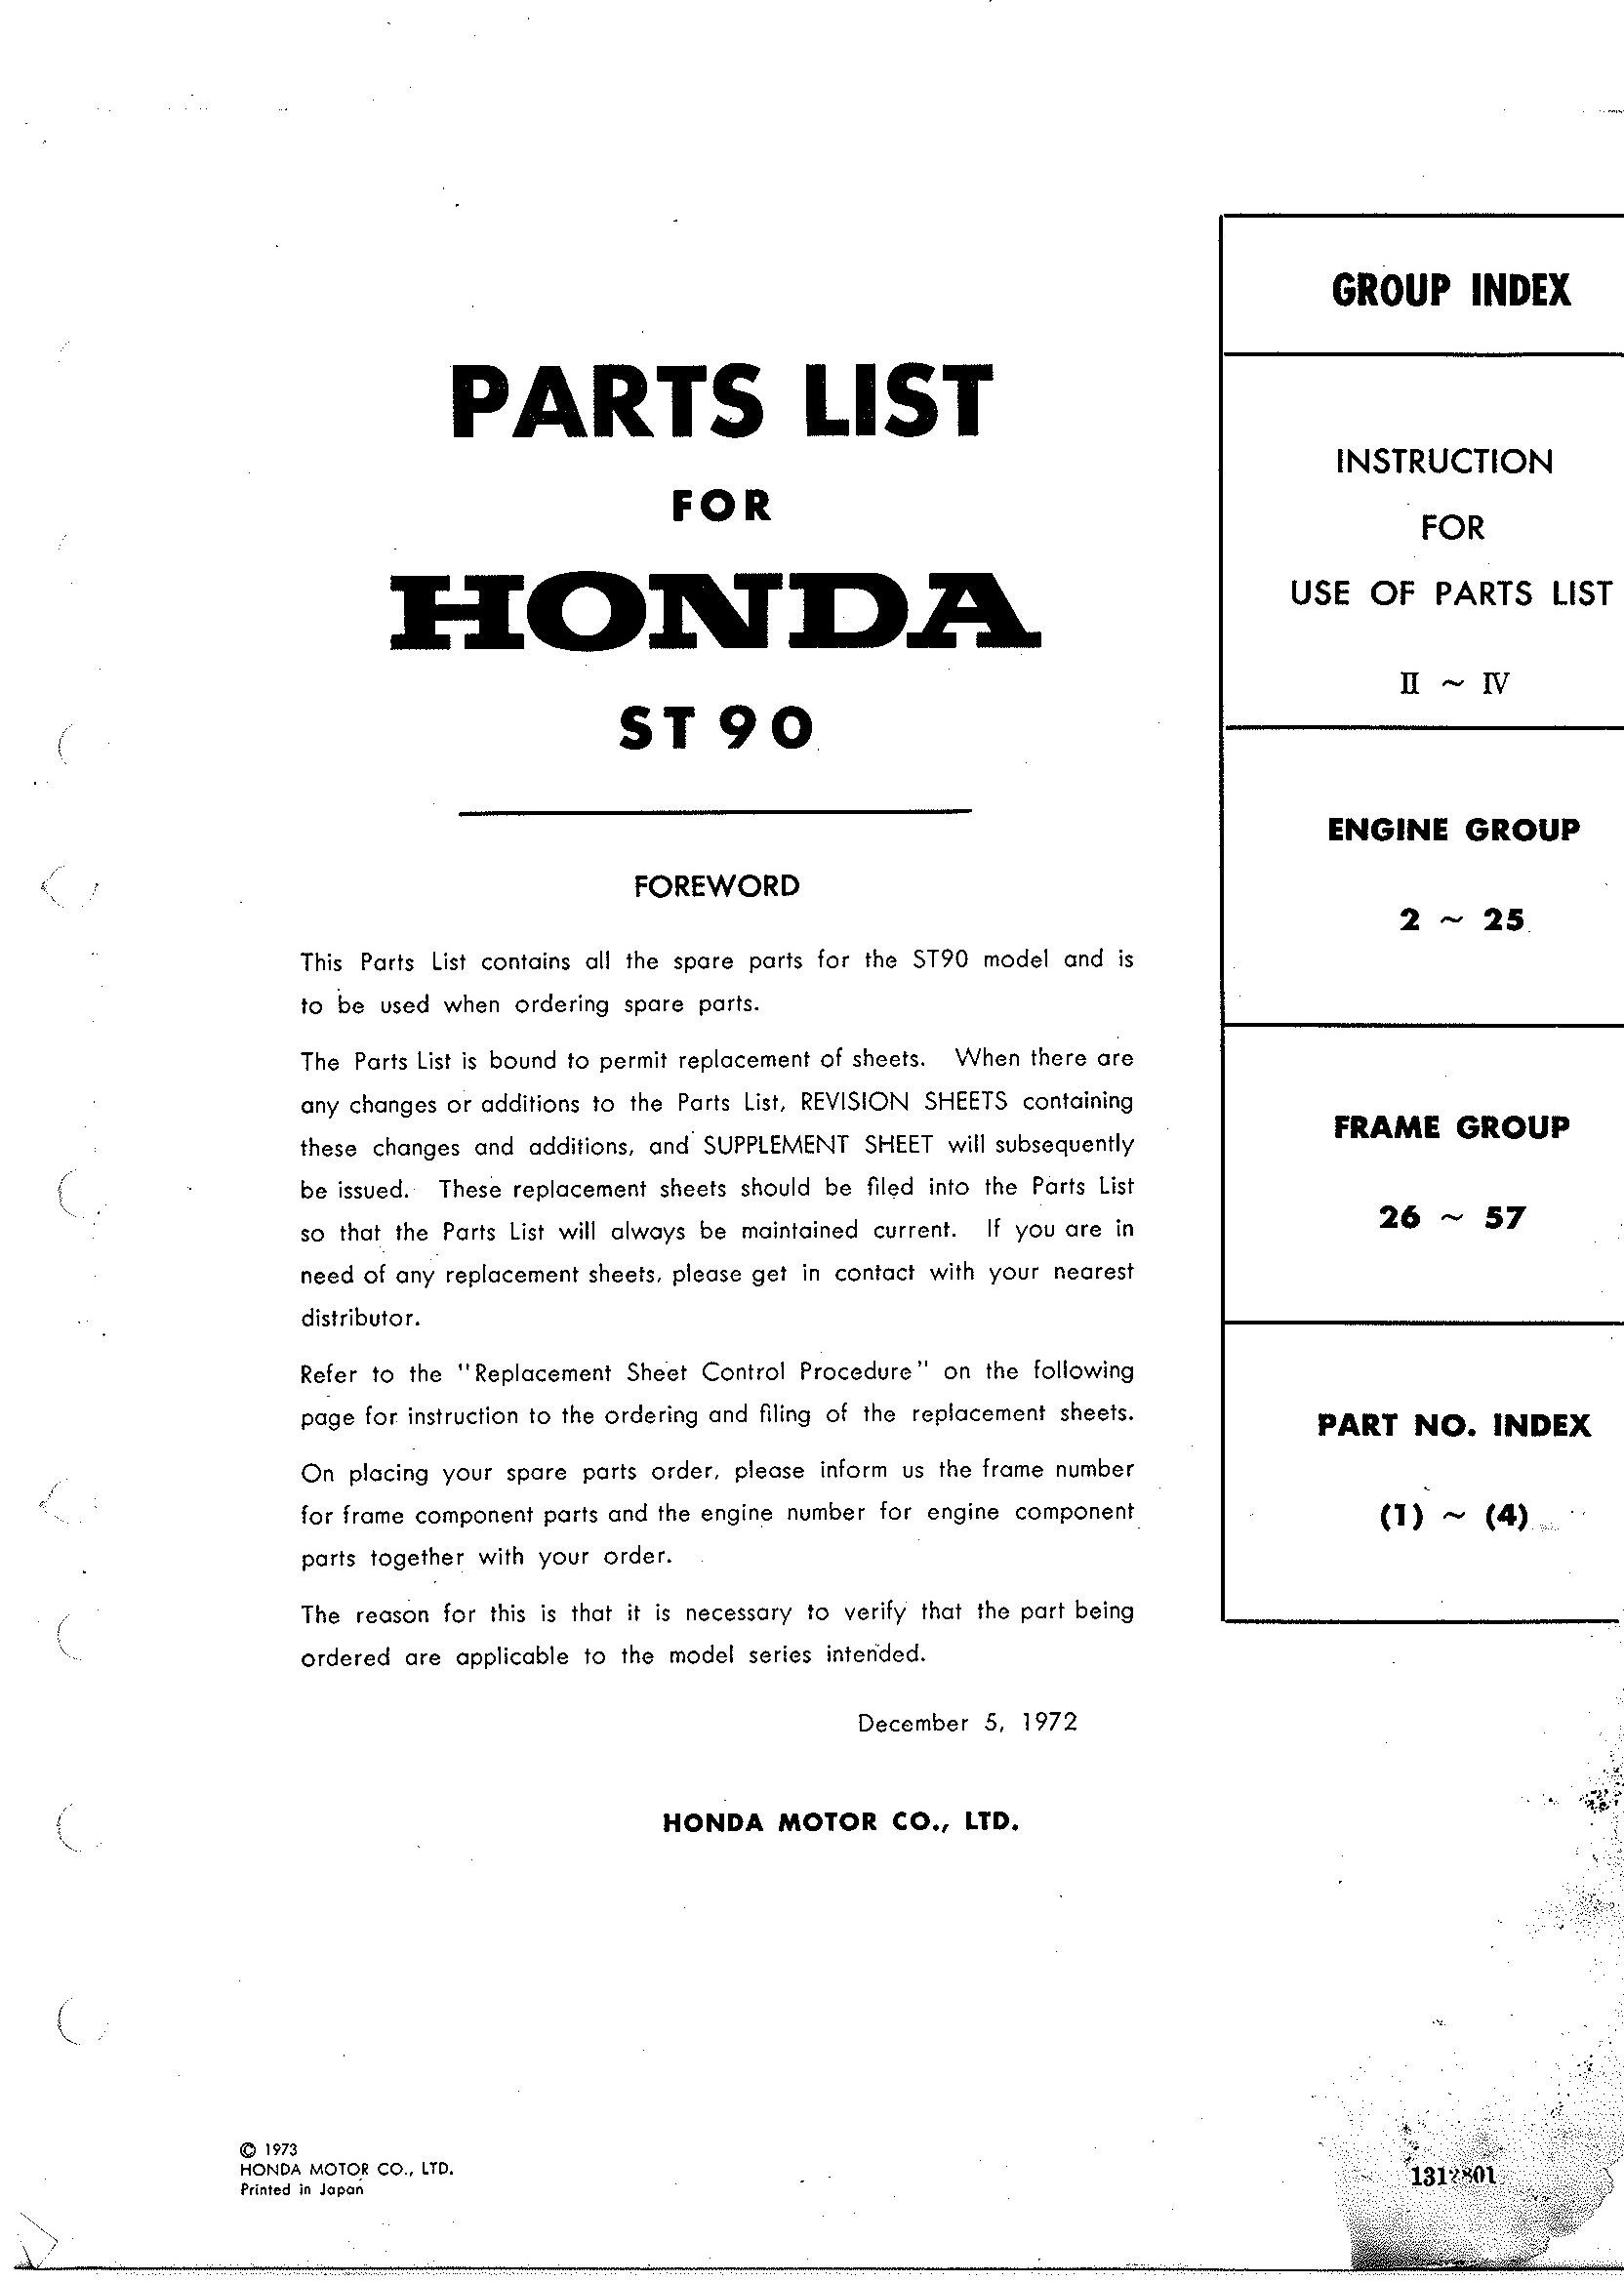 Parts List for Honda ST90 (1973)